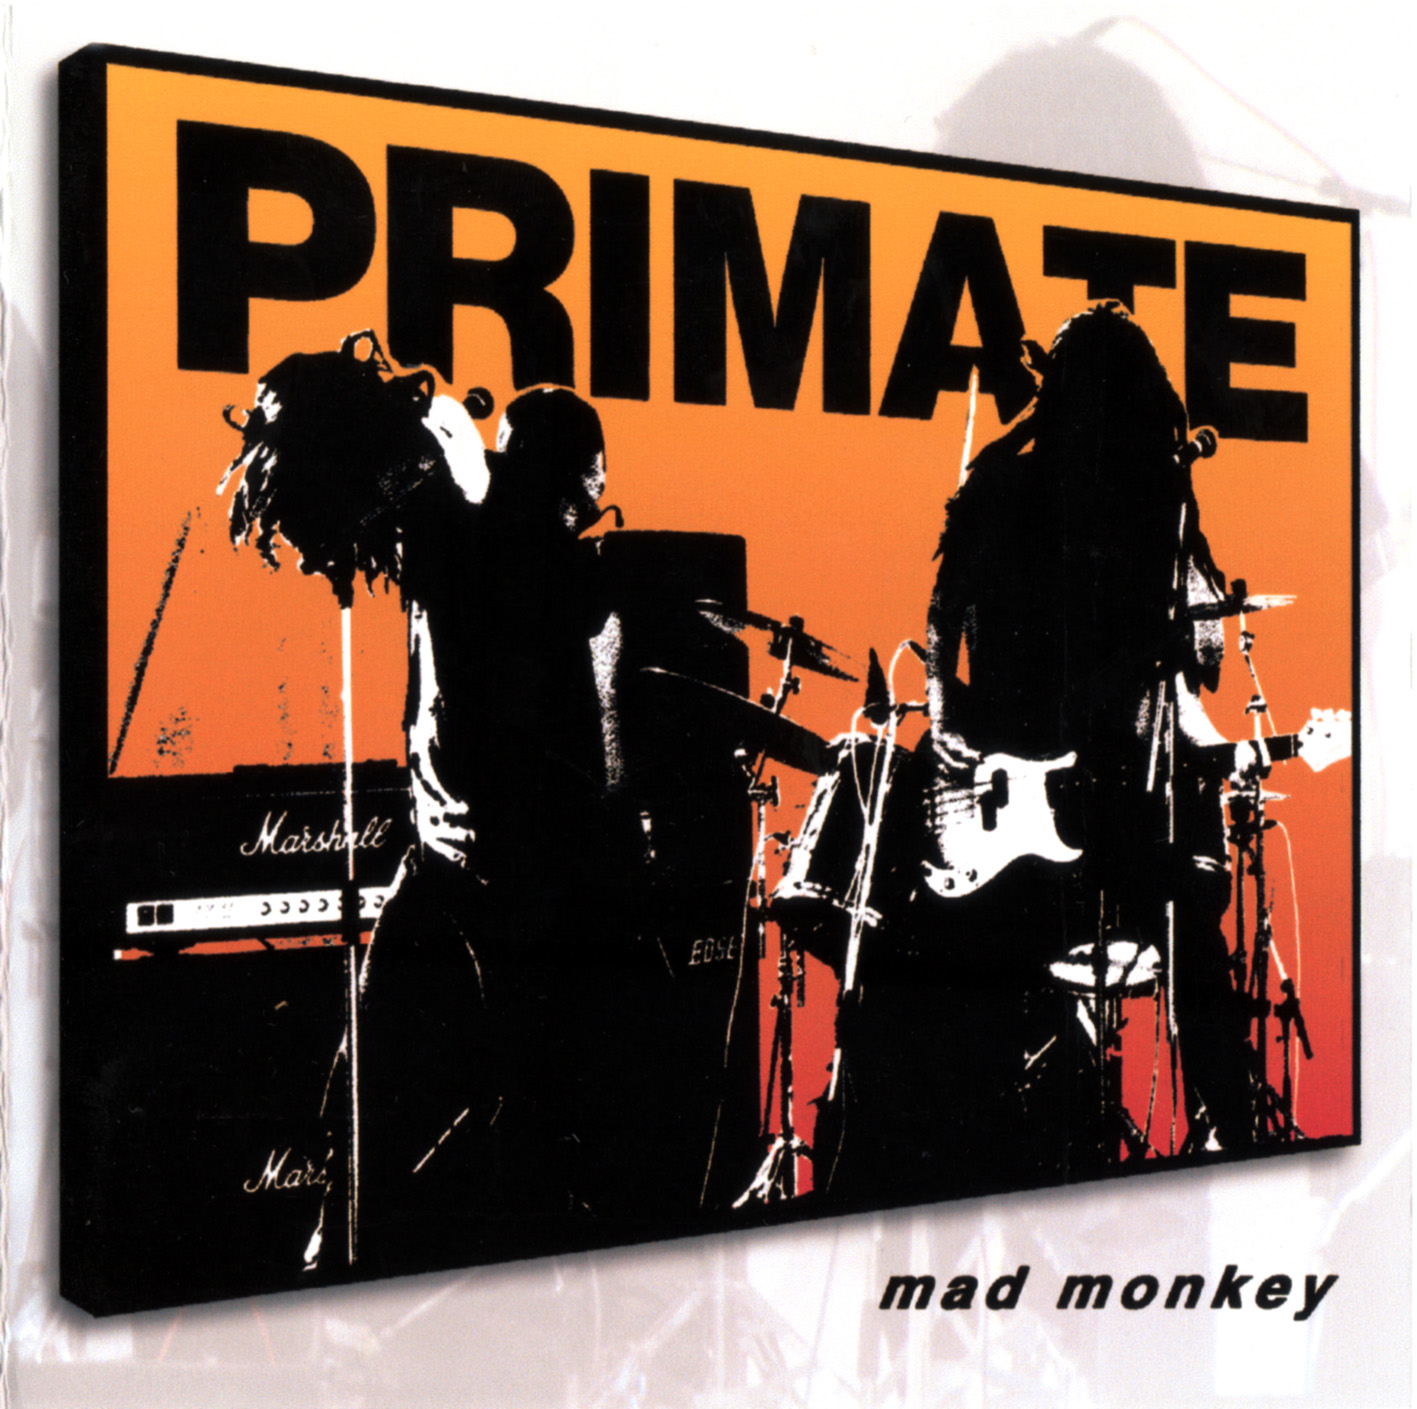 Primate - Mad Monkey